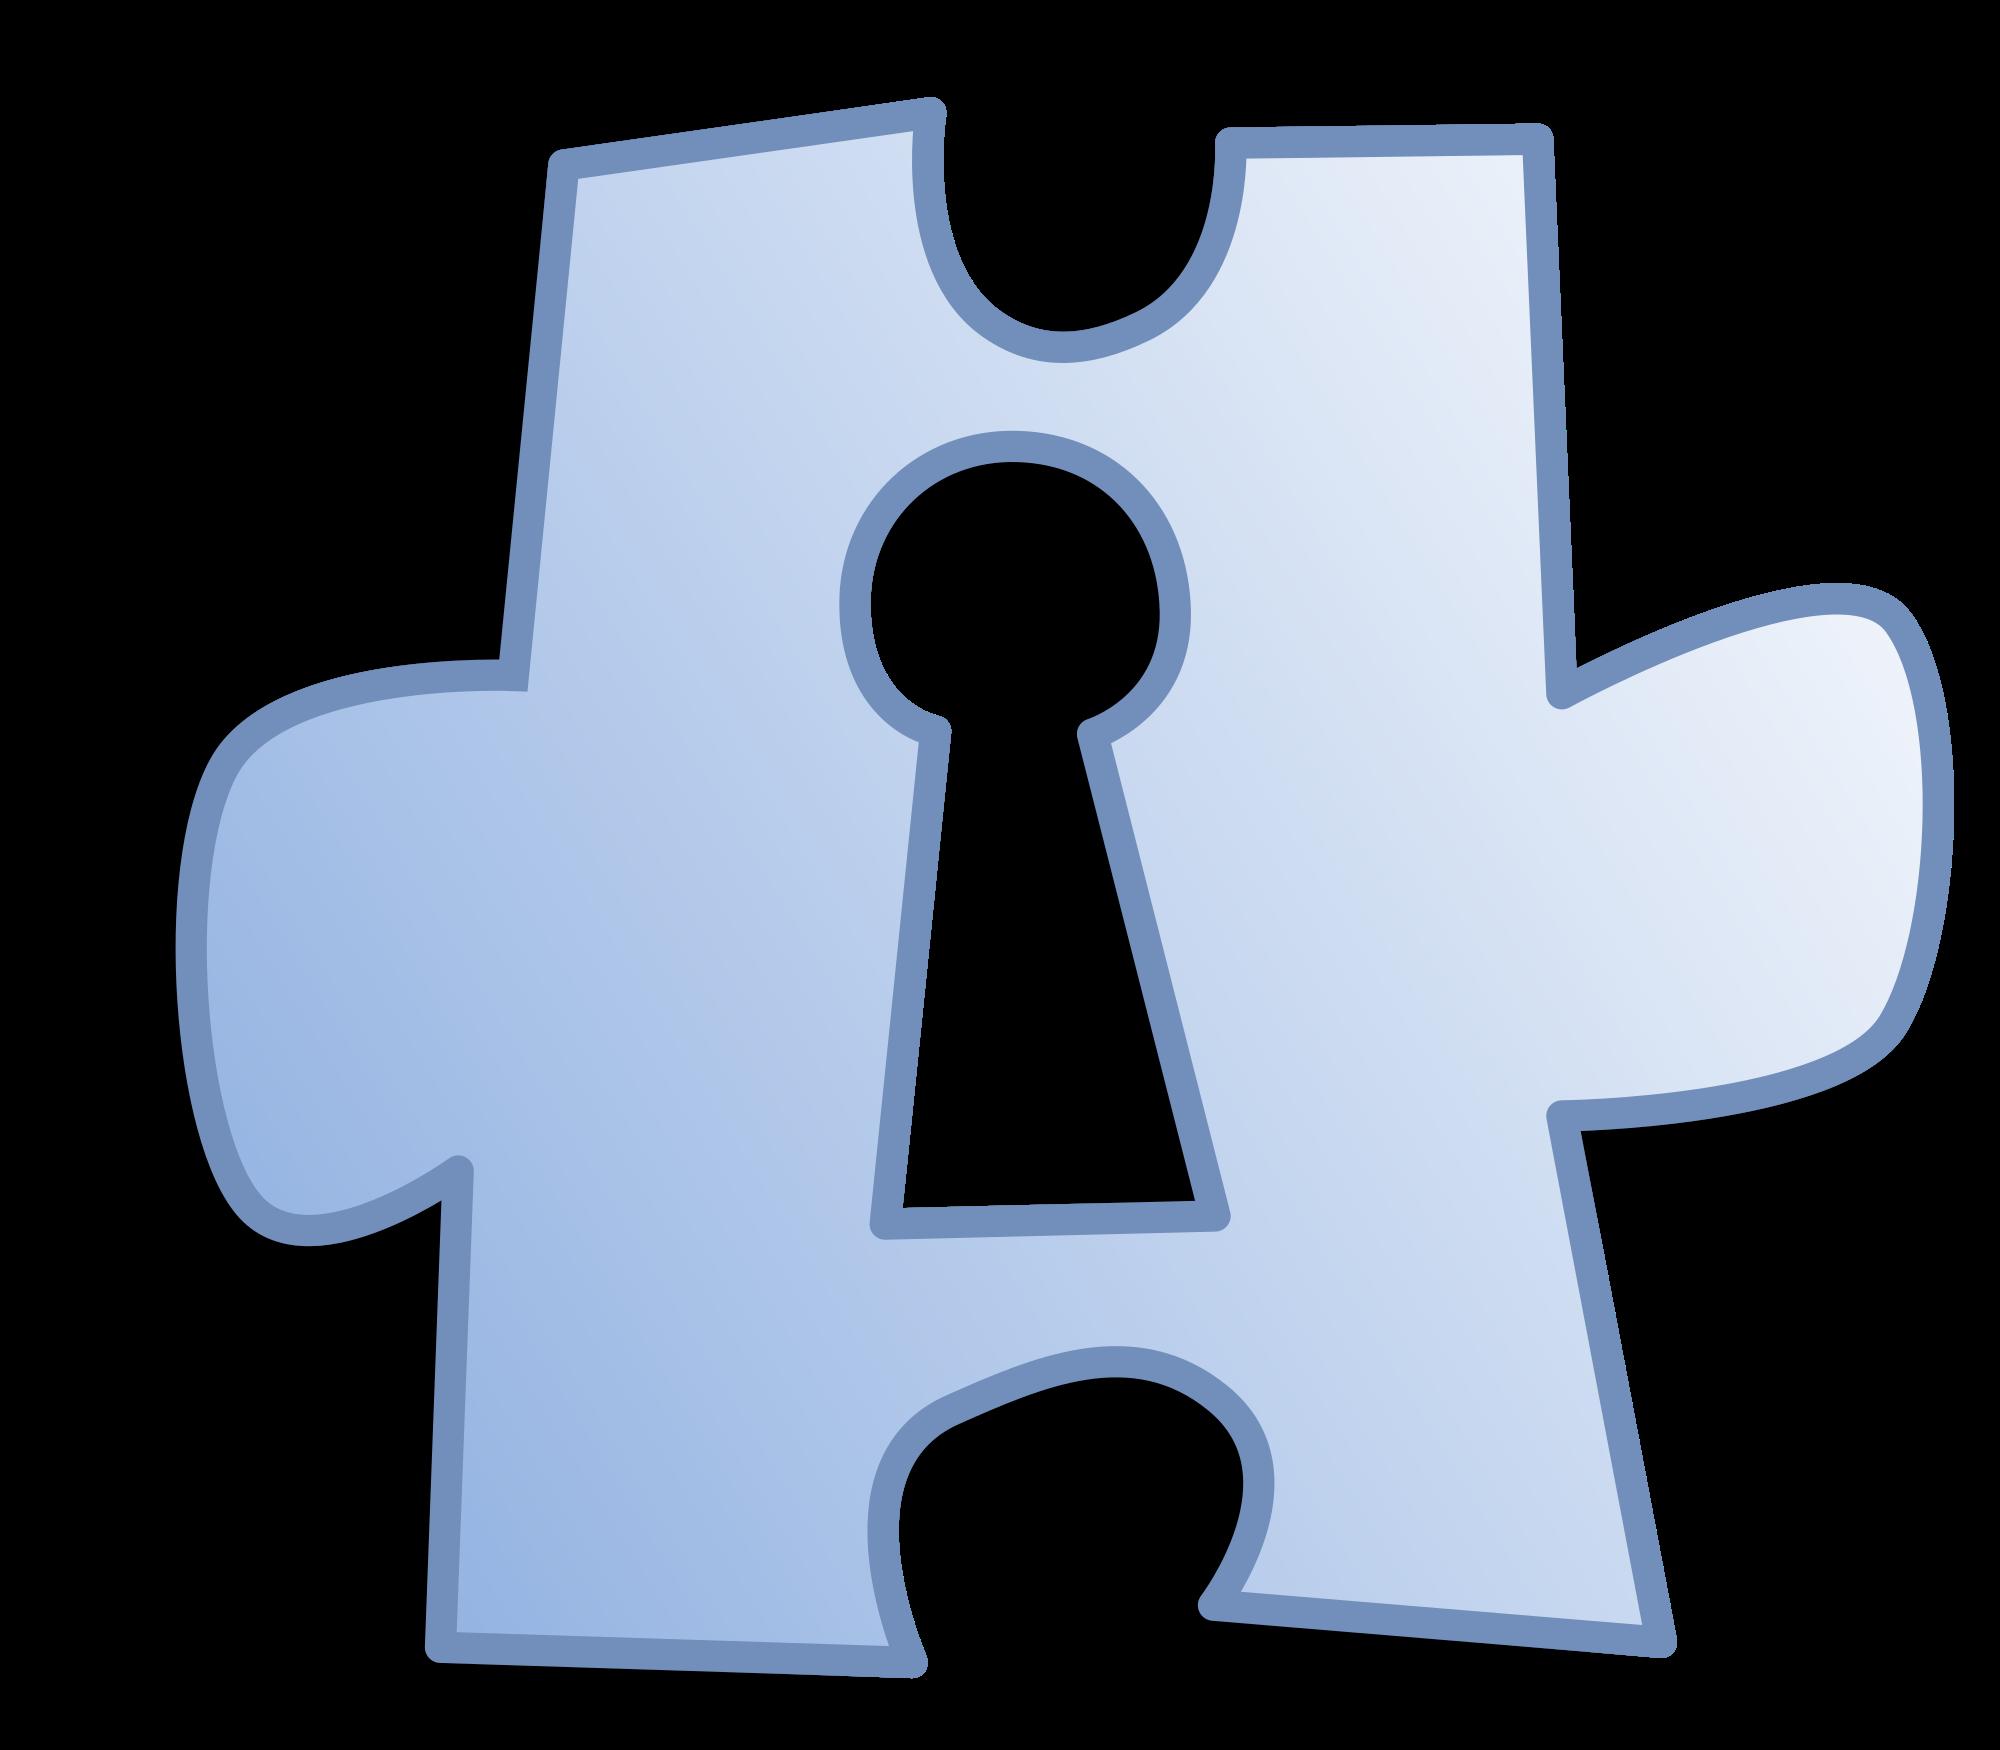 Puzzle clipart project summary. File portal svg wikimedia